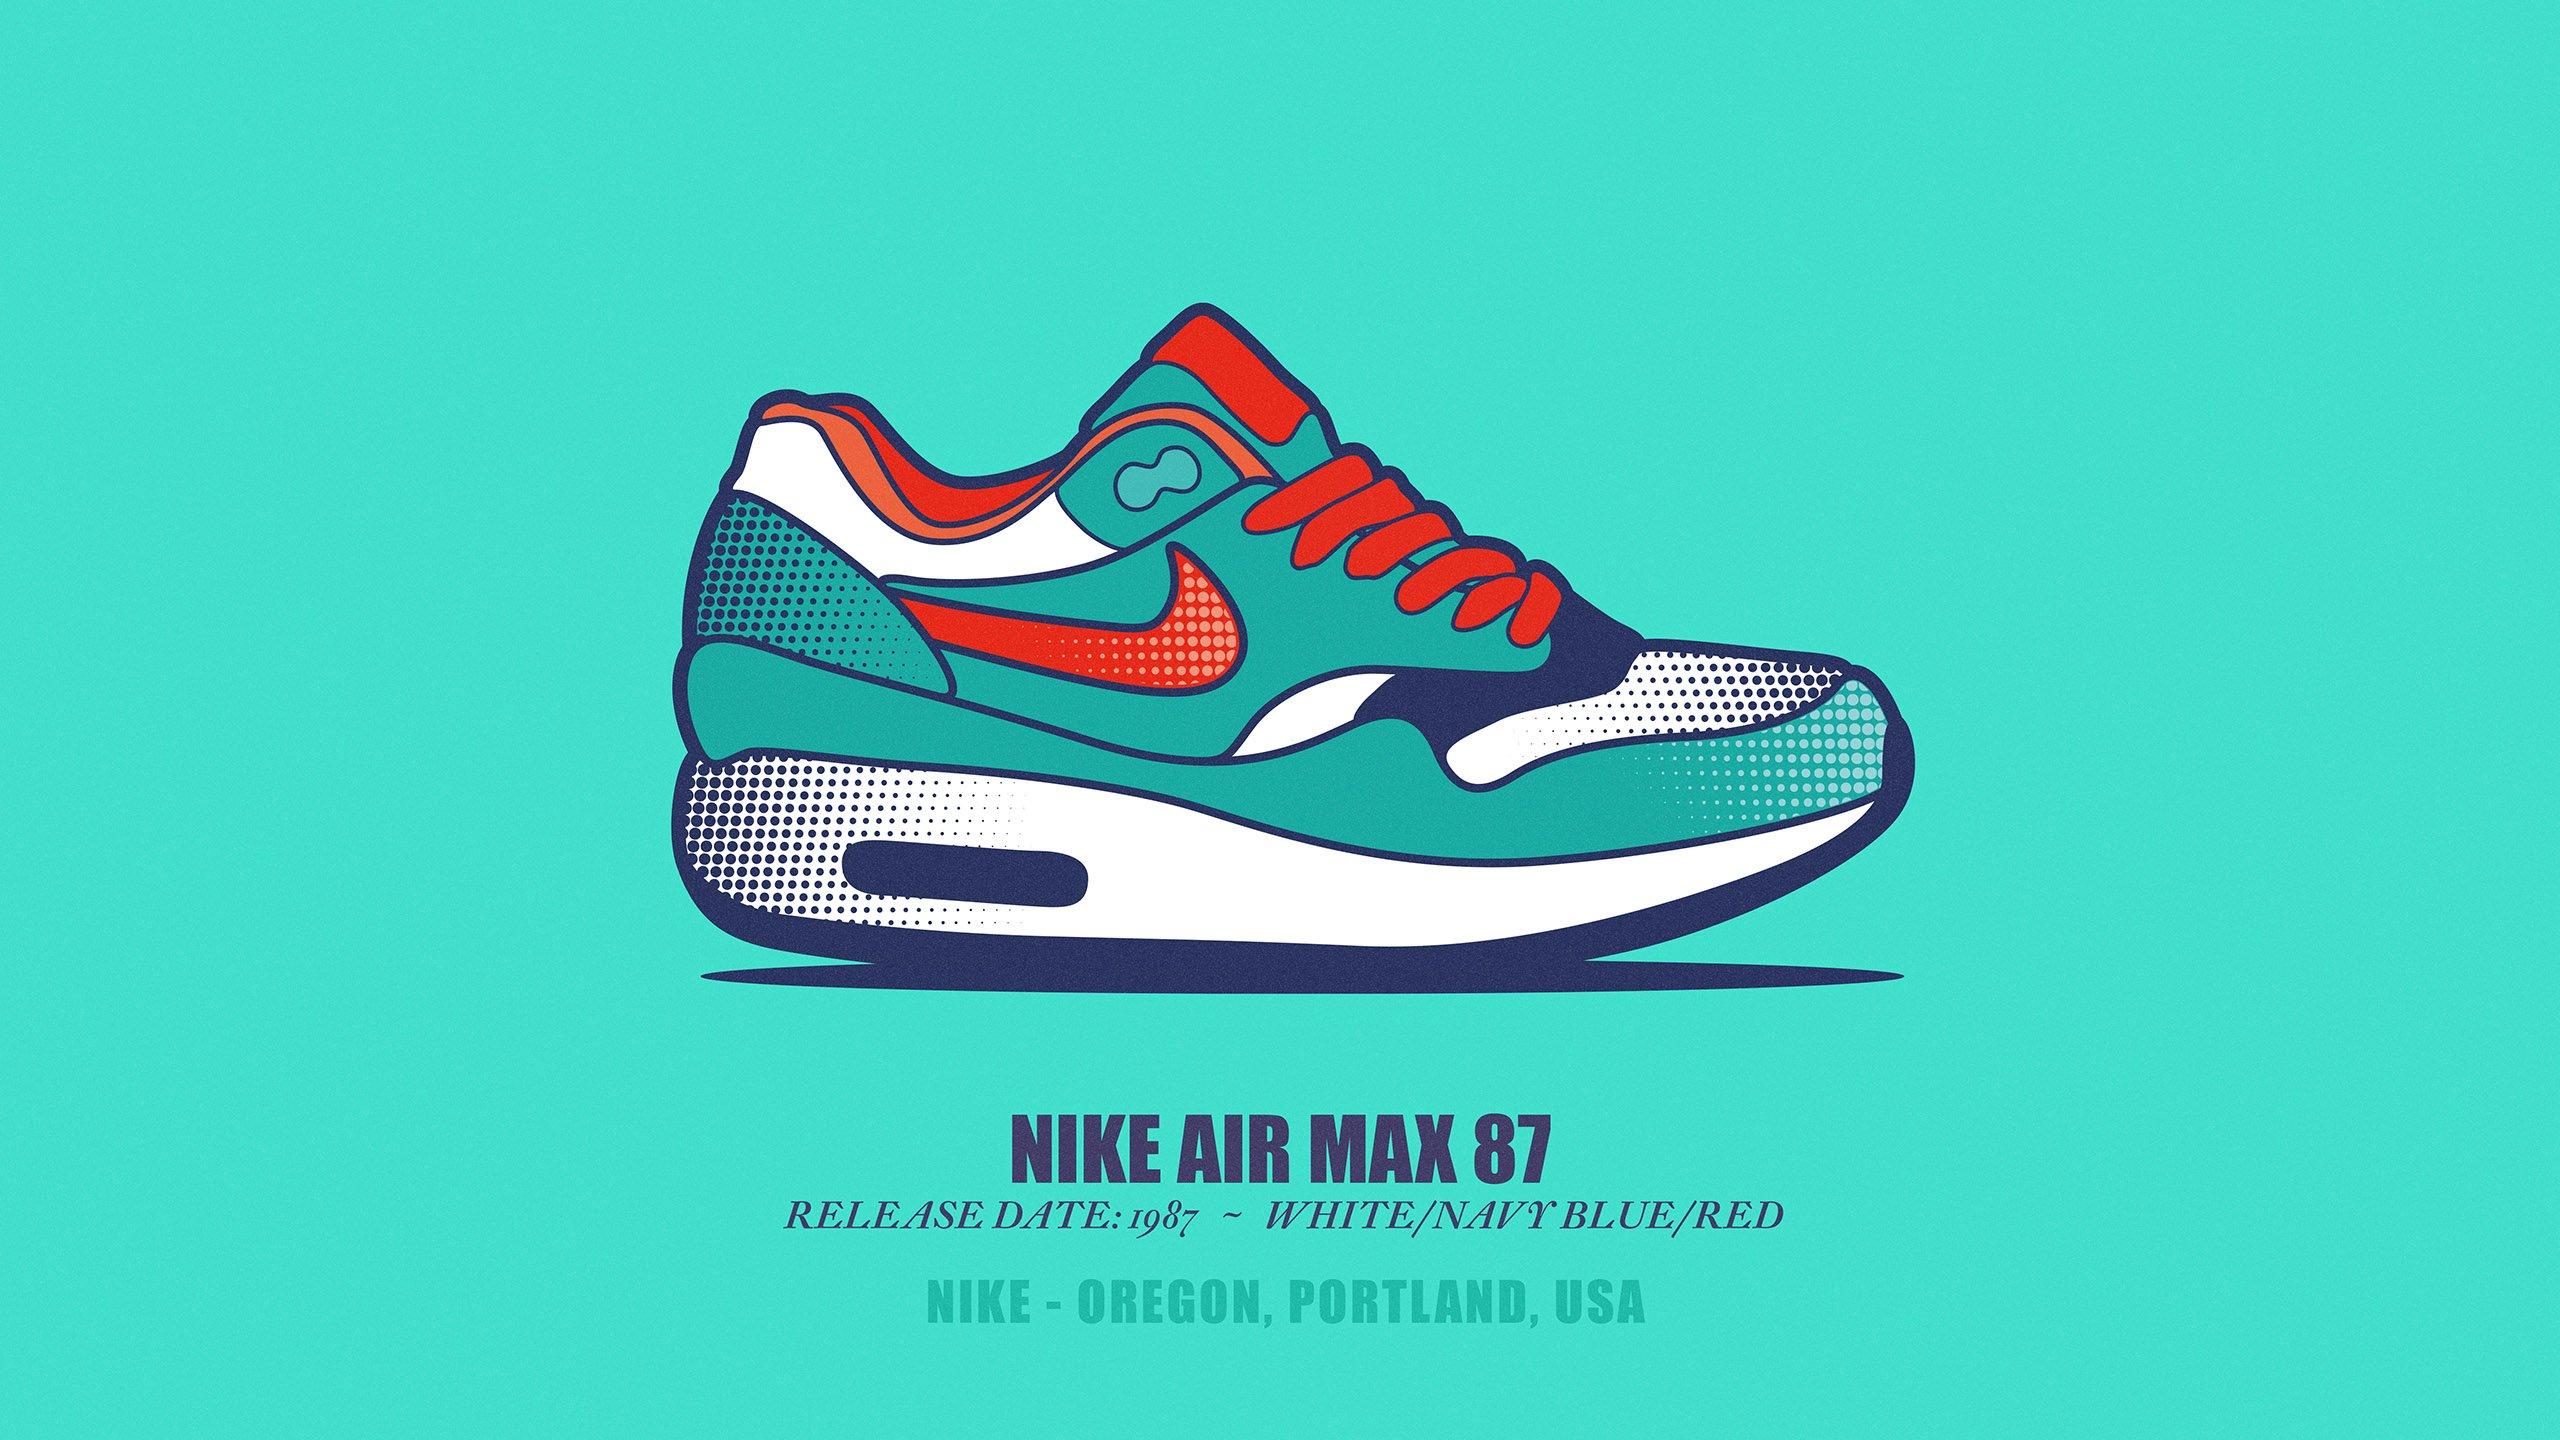 Nike Ipad Wallpaper: Nike IPad Wallpaper